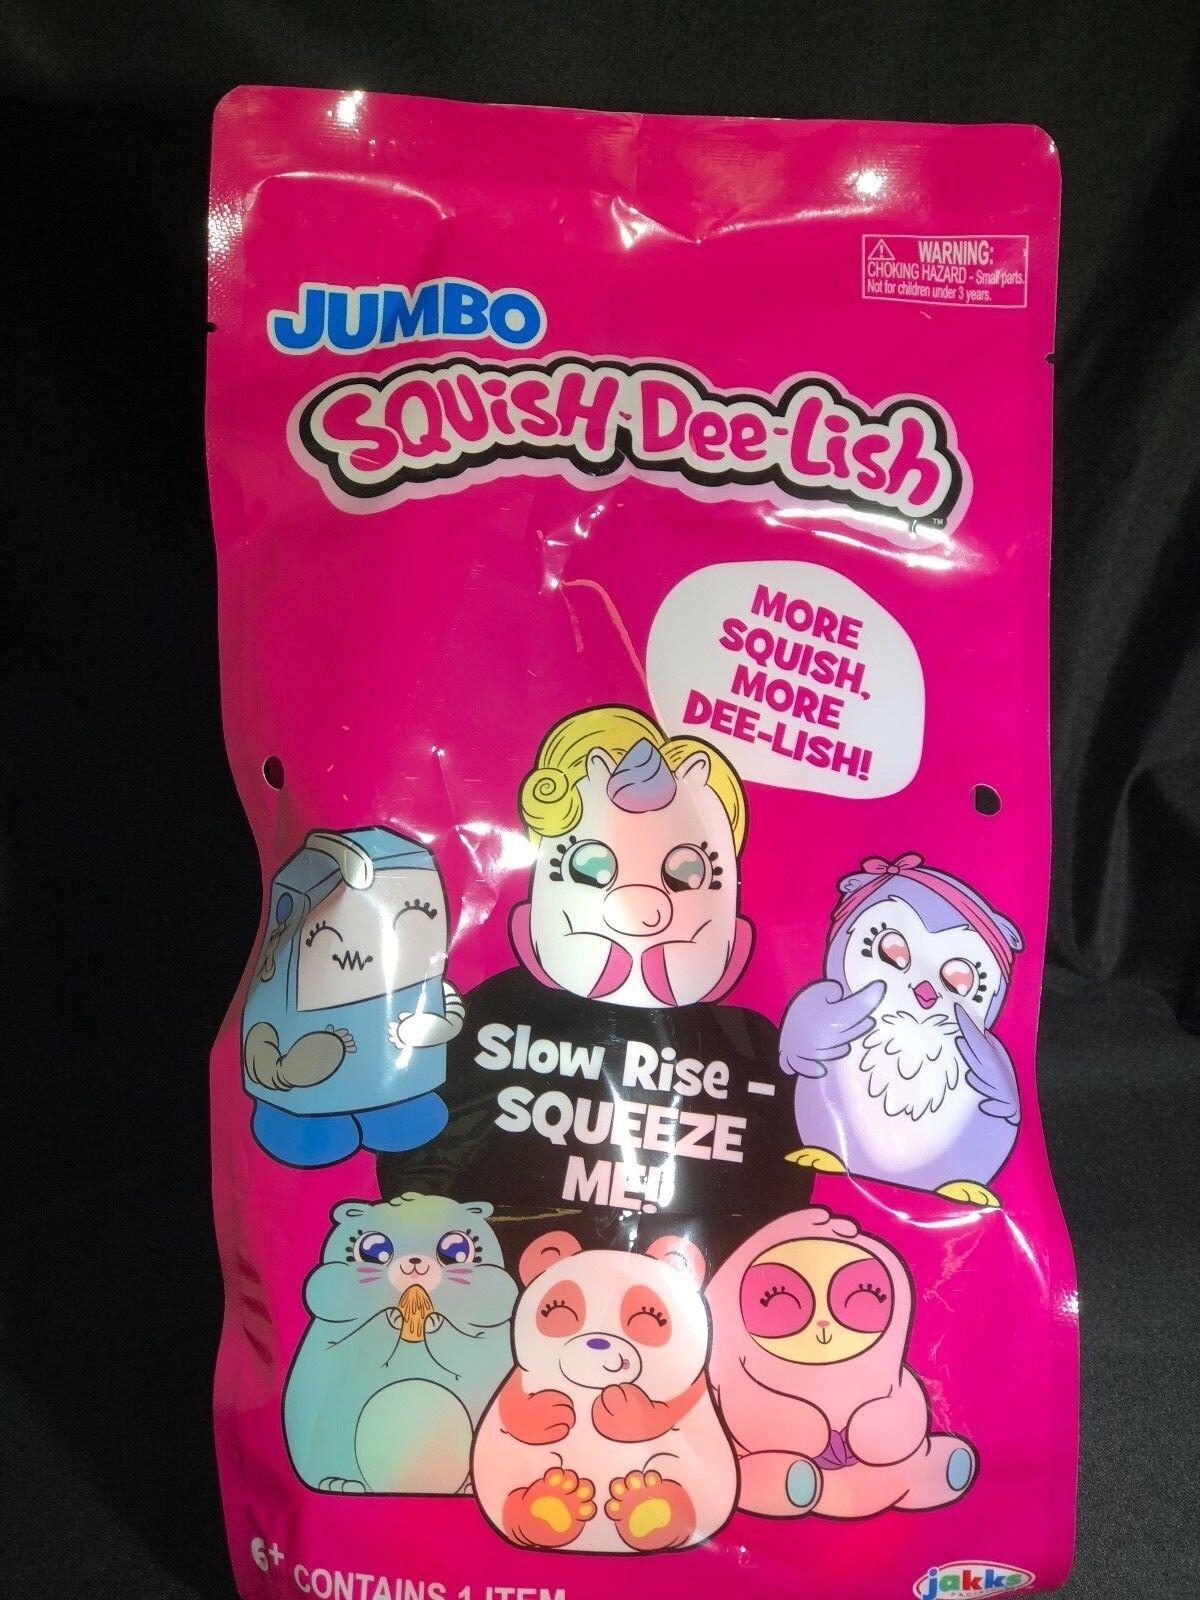 JUMBO SQUISH - DEE - LISH SLOW RISE BLIND BLIND BLIND BAG BRAND NEW FACTORY SEALED 540cad